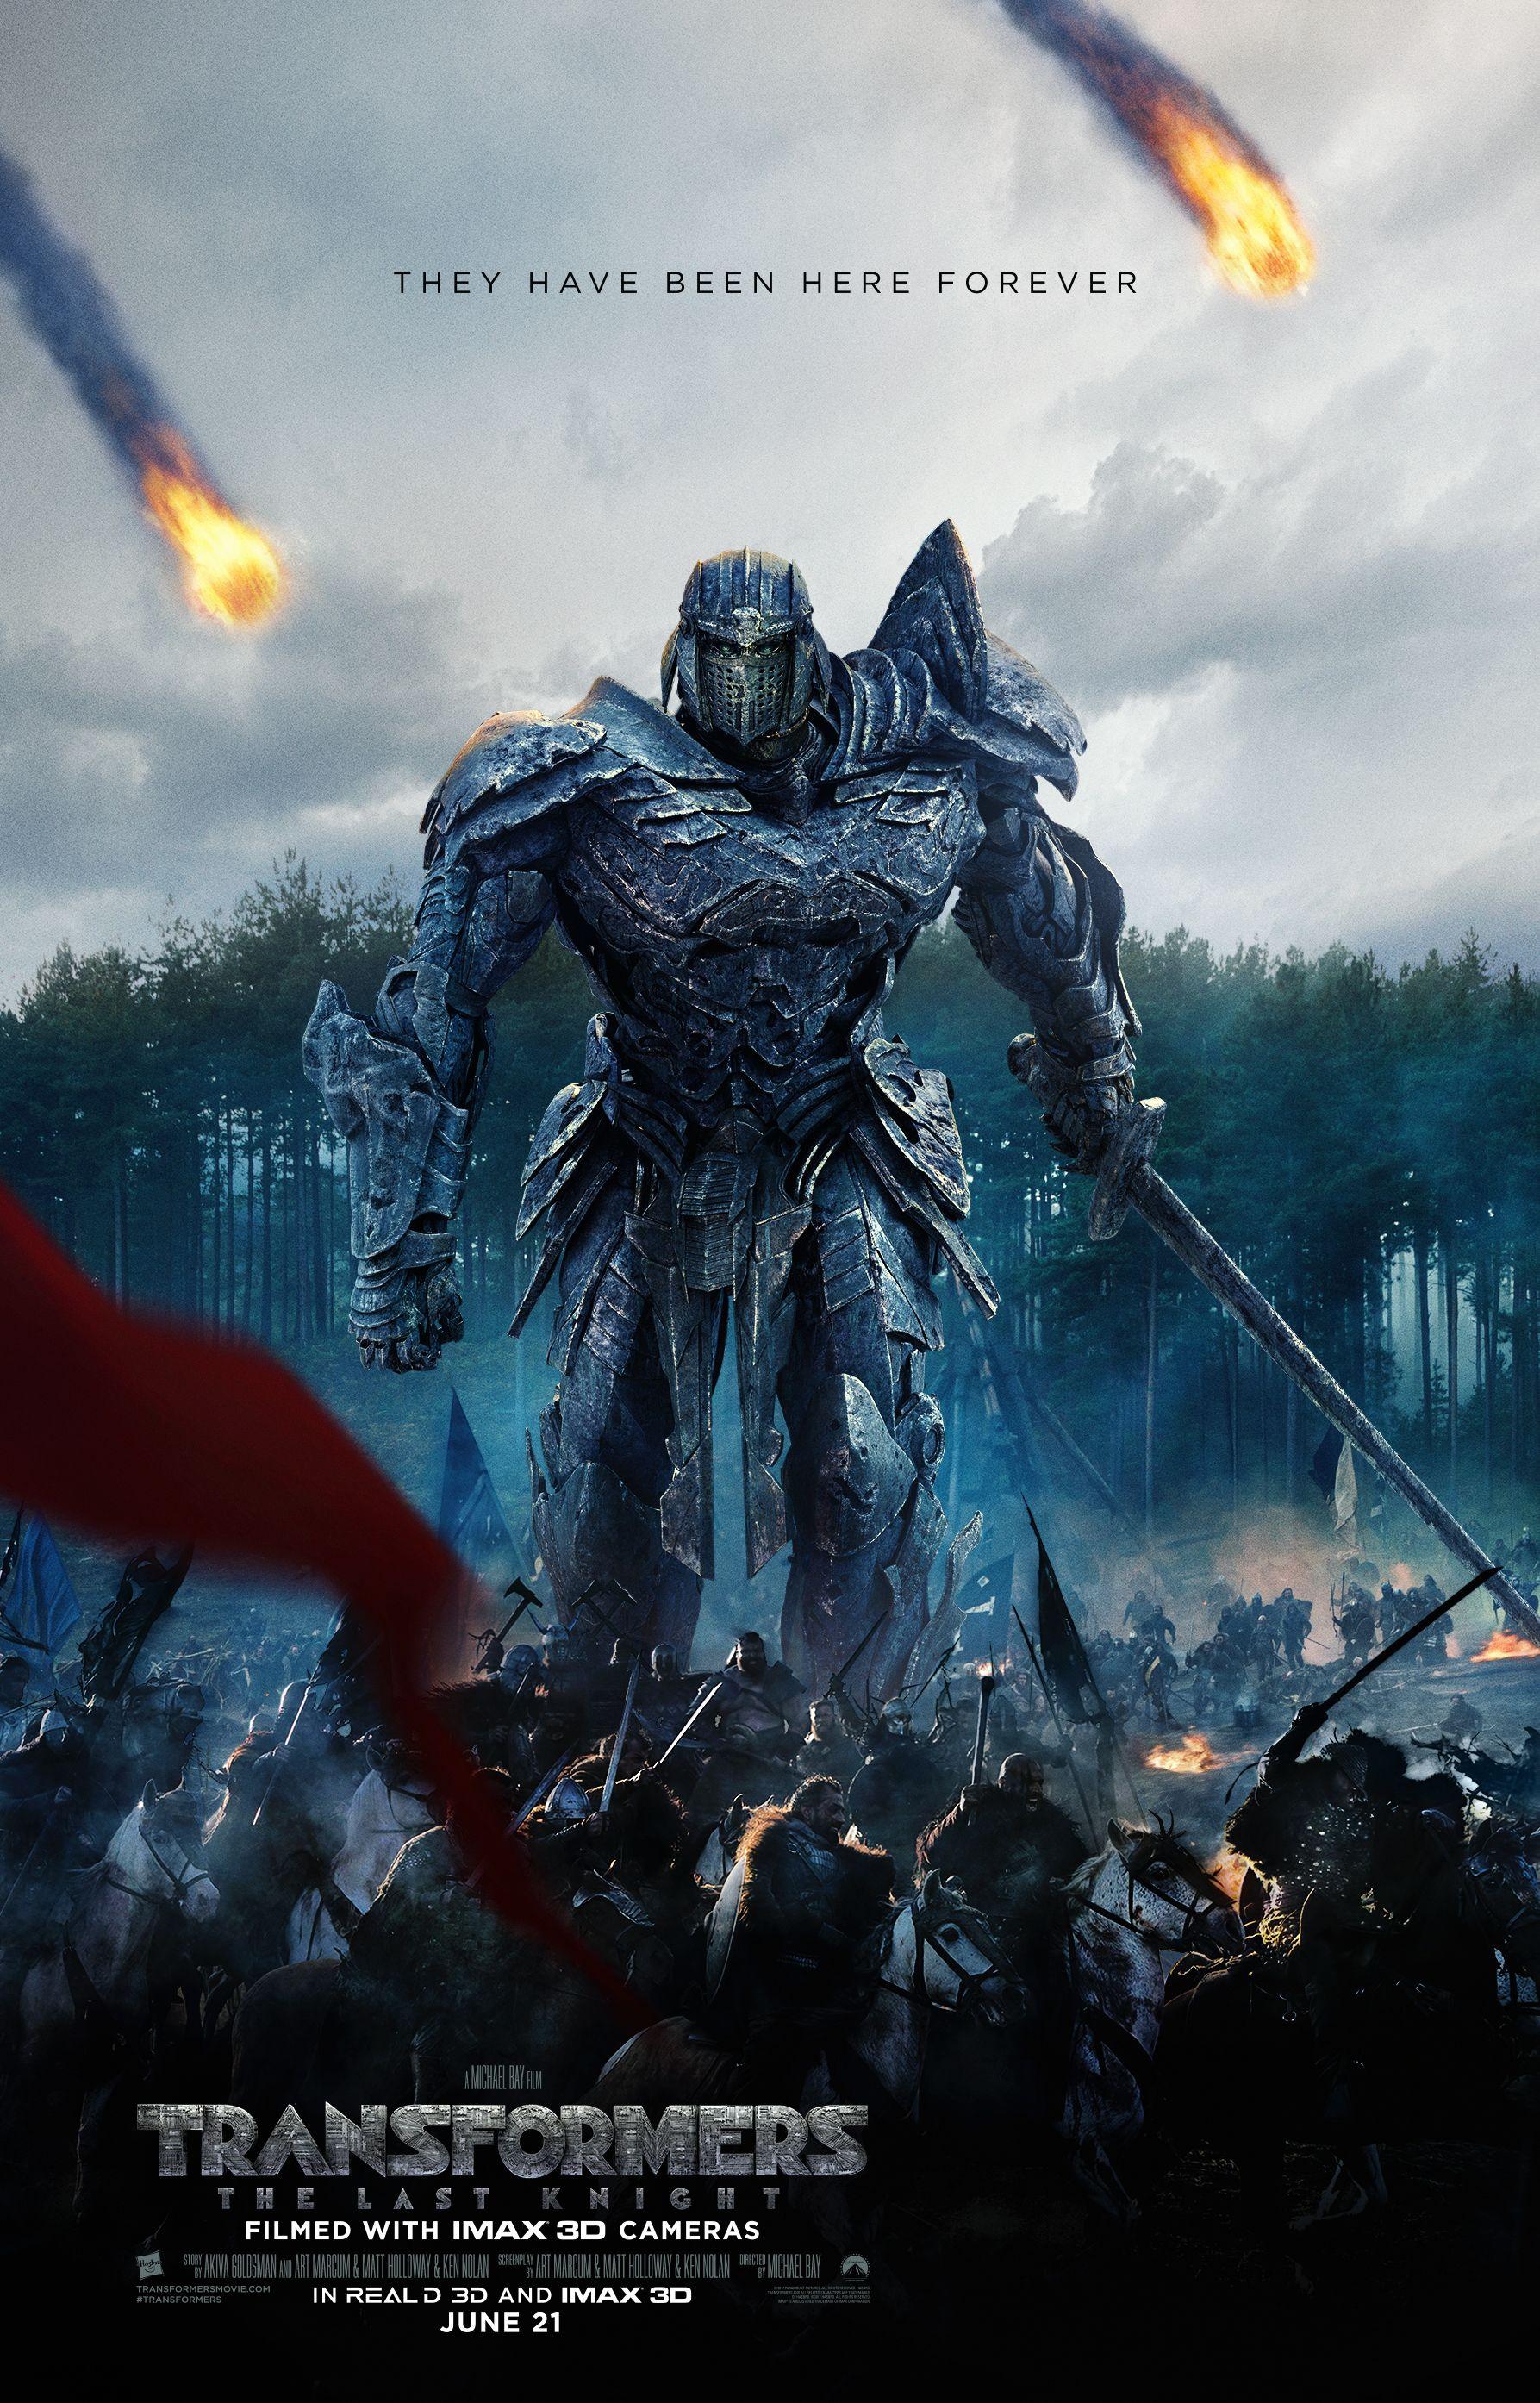 transformers the last knight movie english subtitles